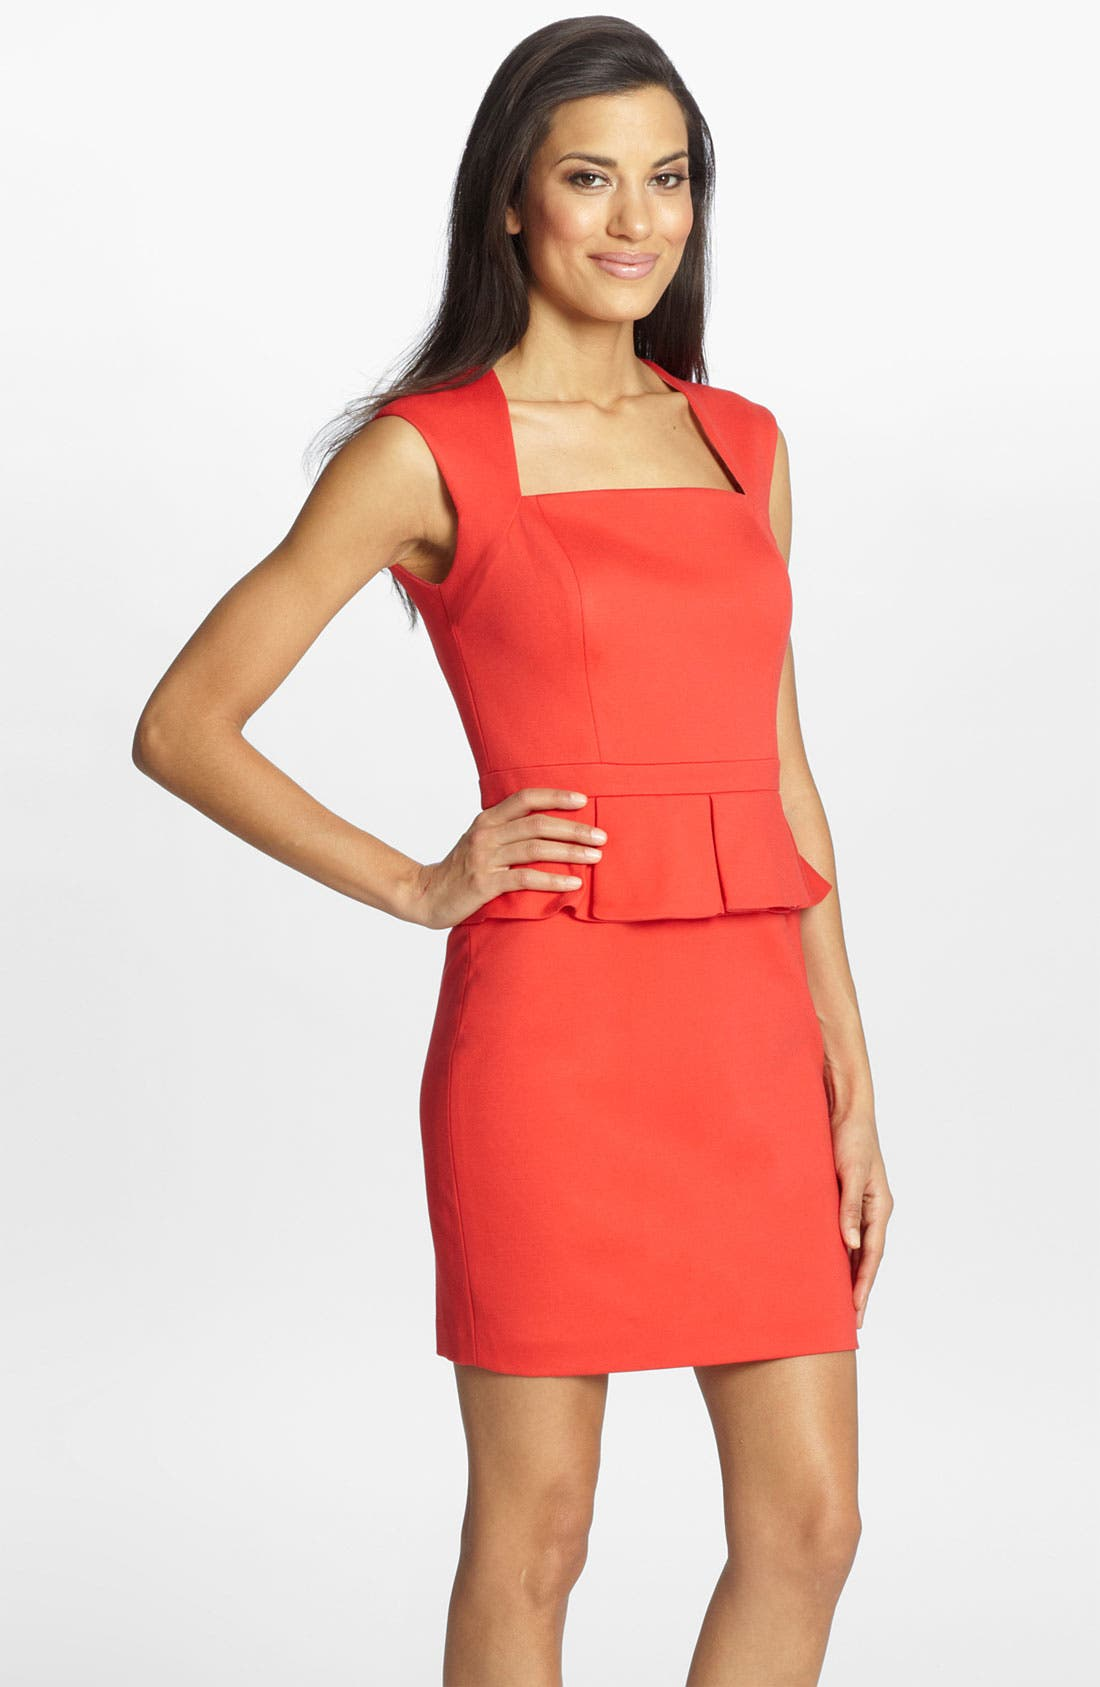 Alternate Image 1 Selected - Cynthia Steffe 'Mia' Ponte Knit Peplum Dress